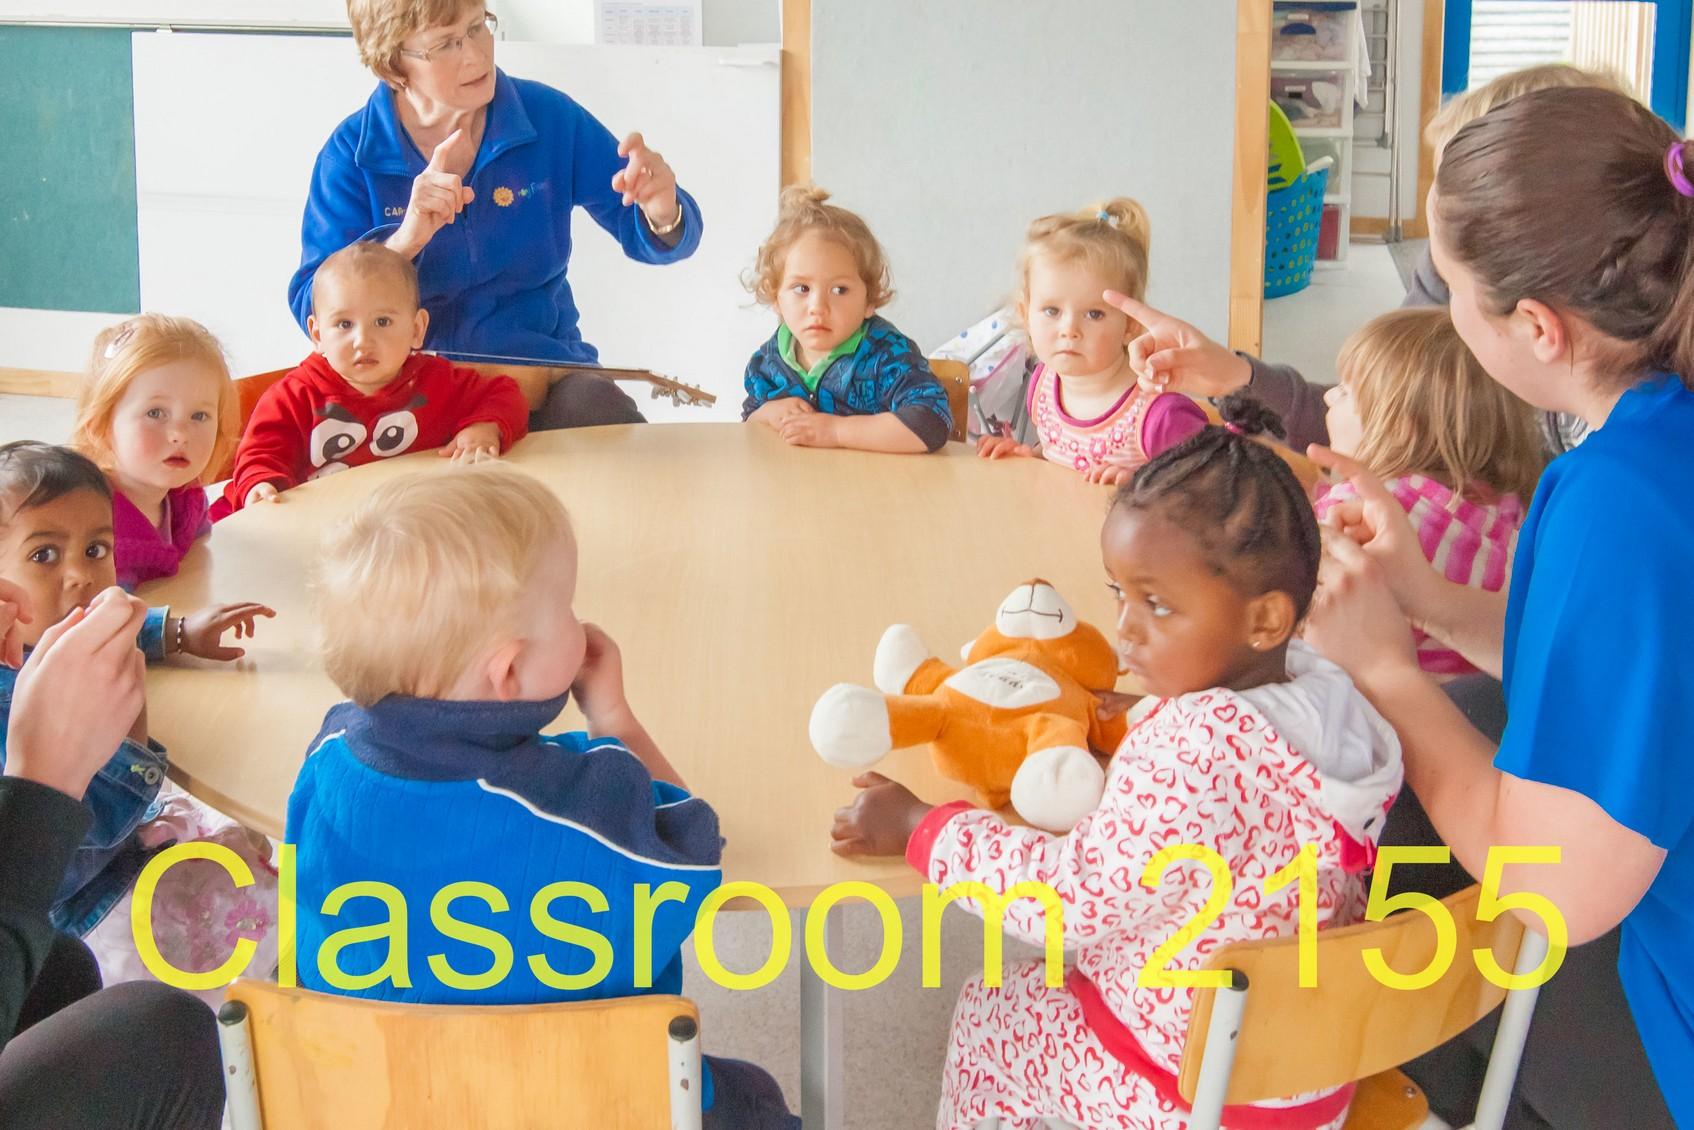 Classroom 2155